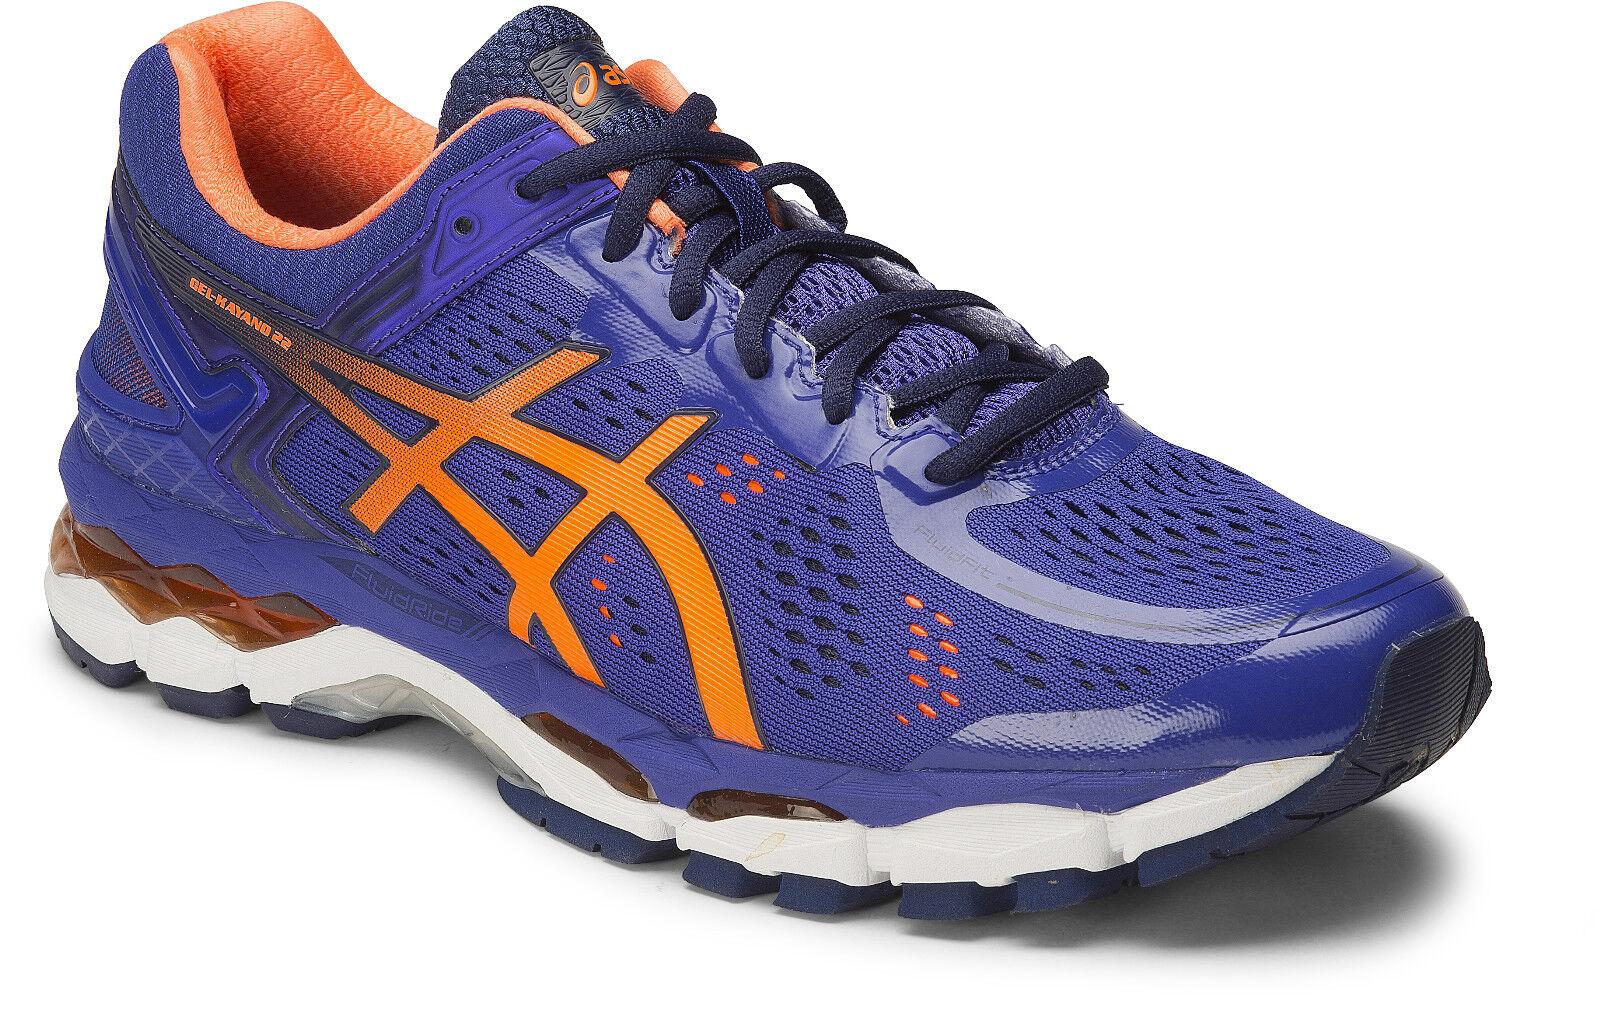 NEW   Asics Gel Kayano 22 Homme Flexible Running Chaussures (D) (4330)